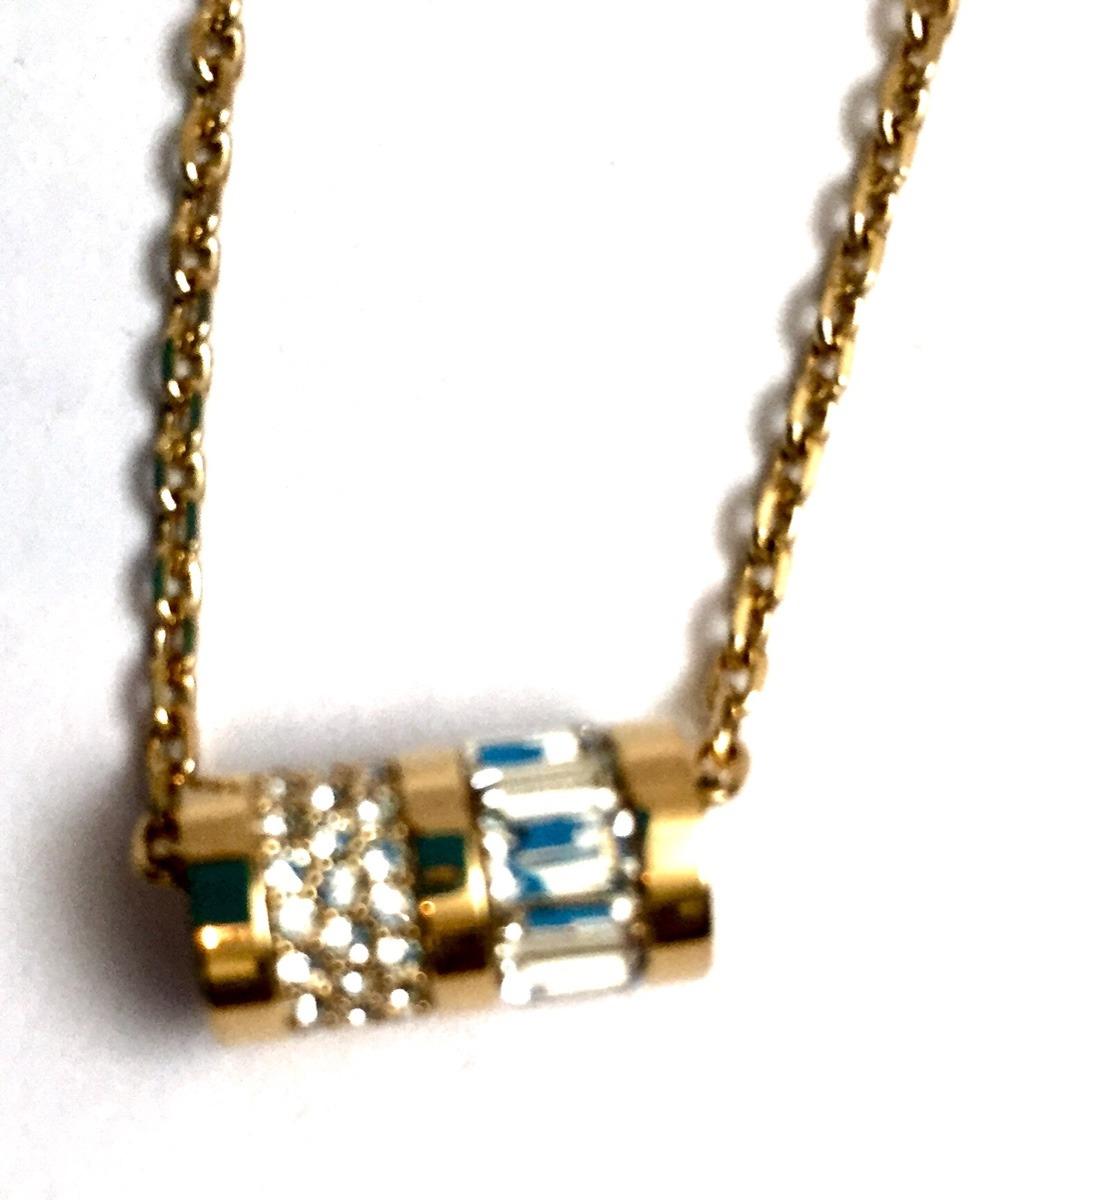 6d443cd62362 collar michael kors mk dorada cilindro nueva original. Cargando zoom.